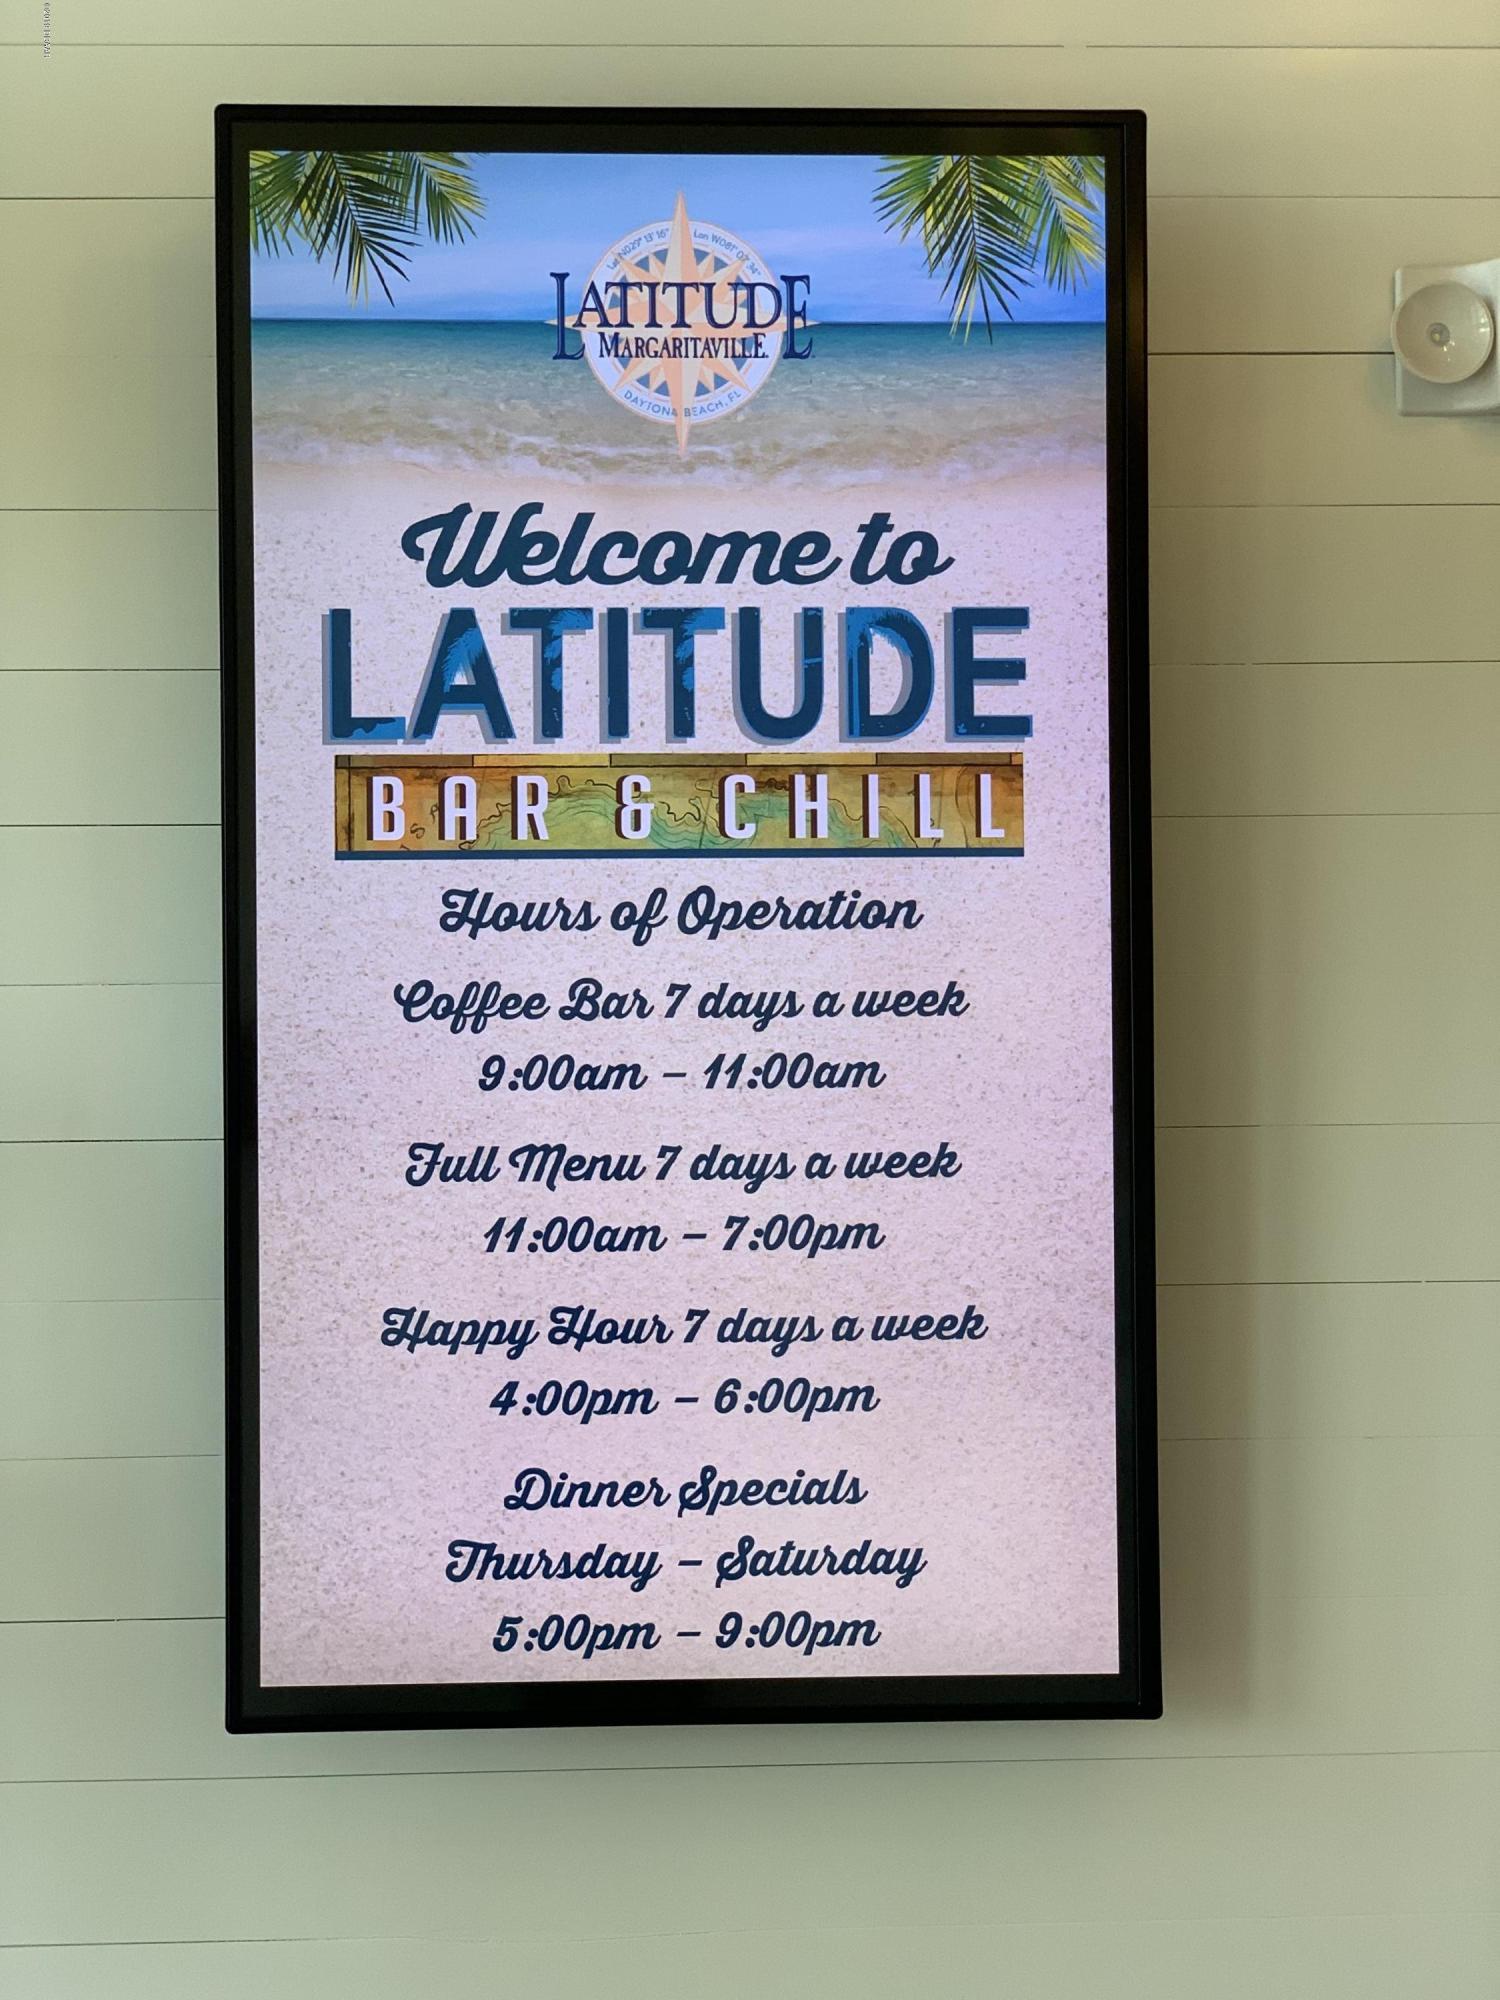 890 Attitude Daytona Beach - 29